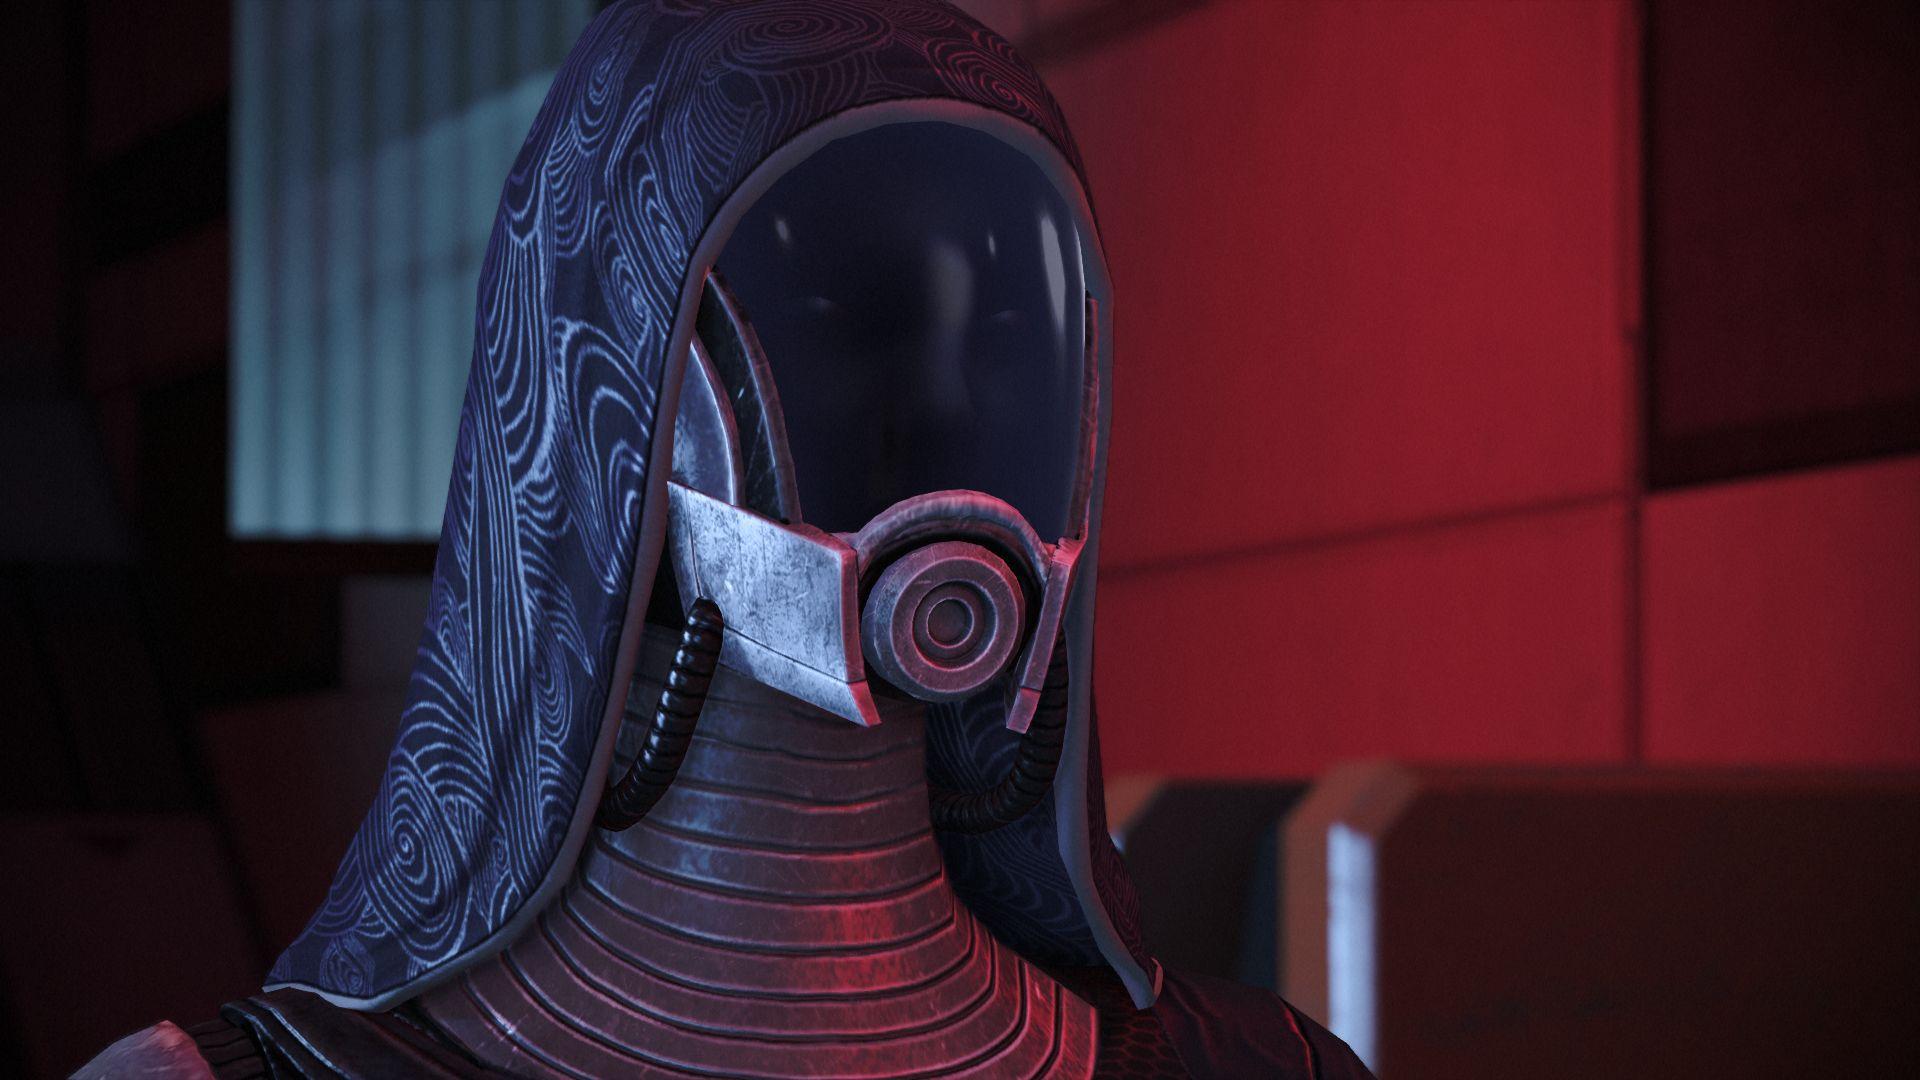 Tali in her helmet